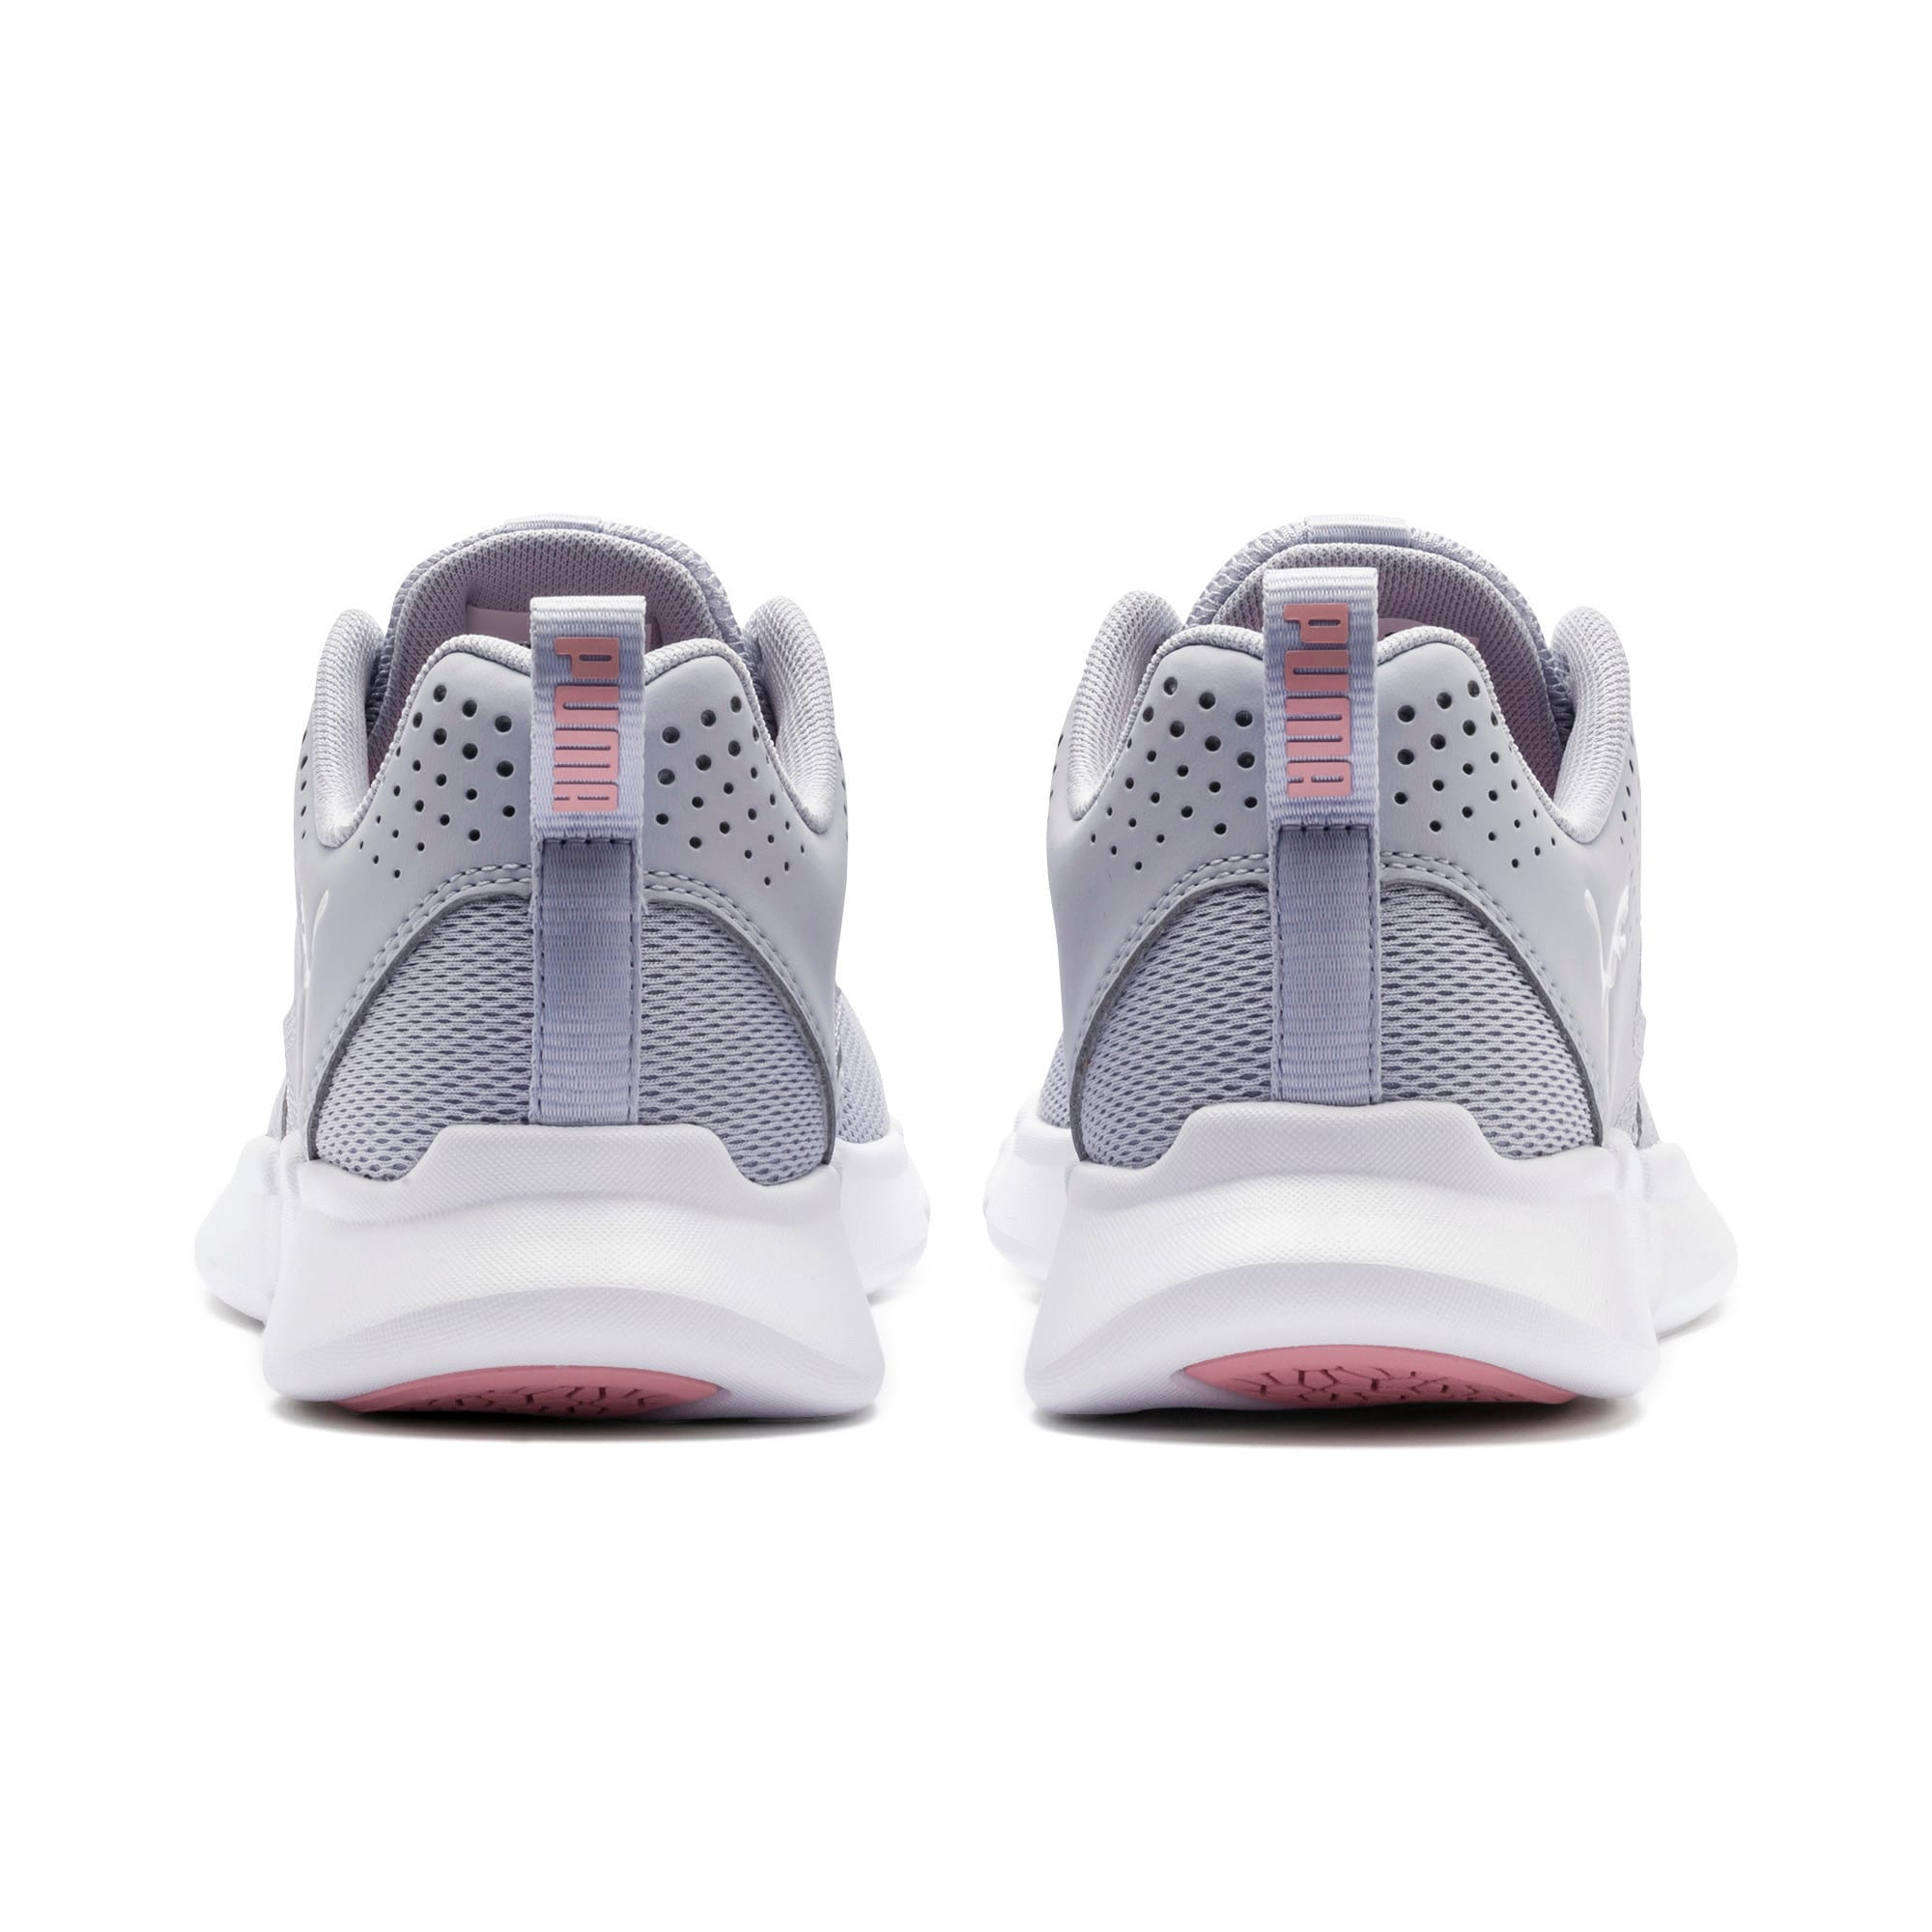 Thumbnail 6 of INTERFLEX Modern Running Shoes, Grey Dawn-Bridal Rose, medium-IND